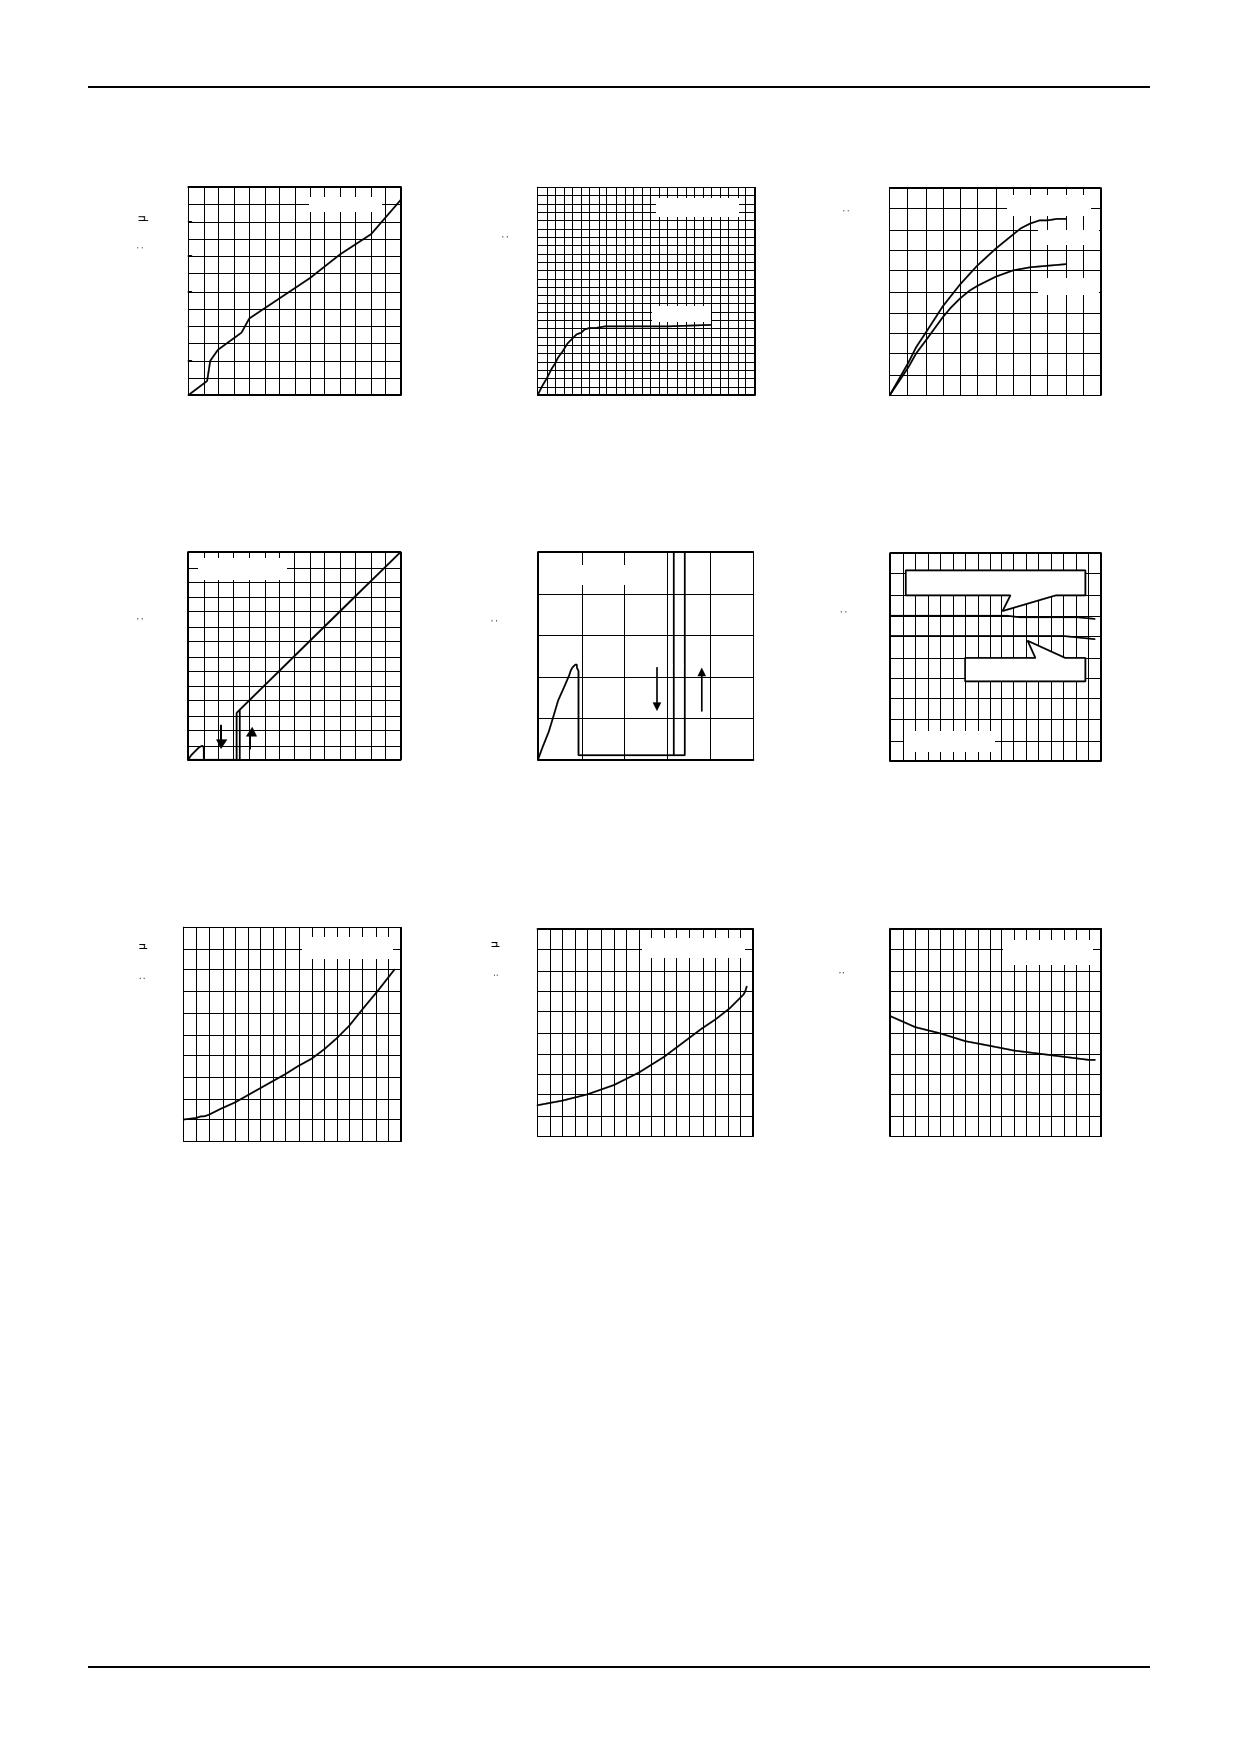 BU4928 pdf, 반도체, 판매, 대치품